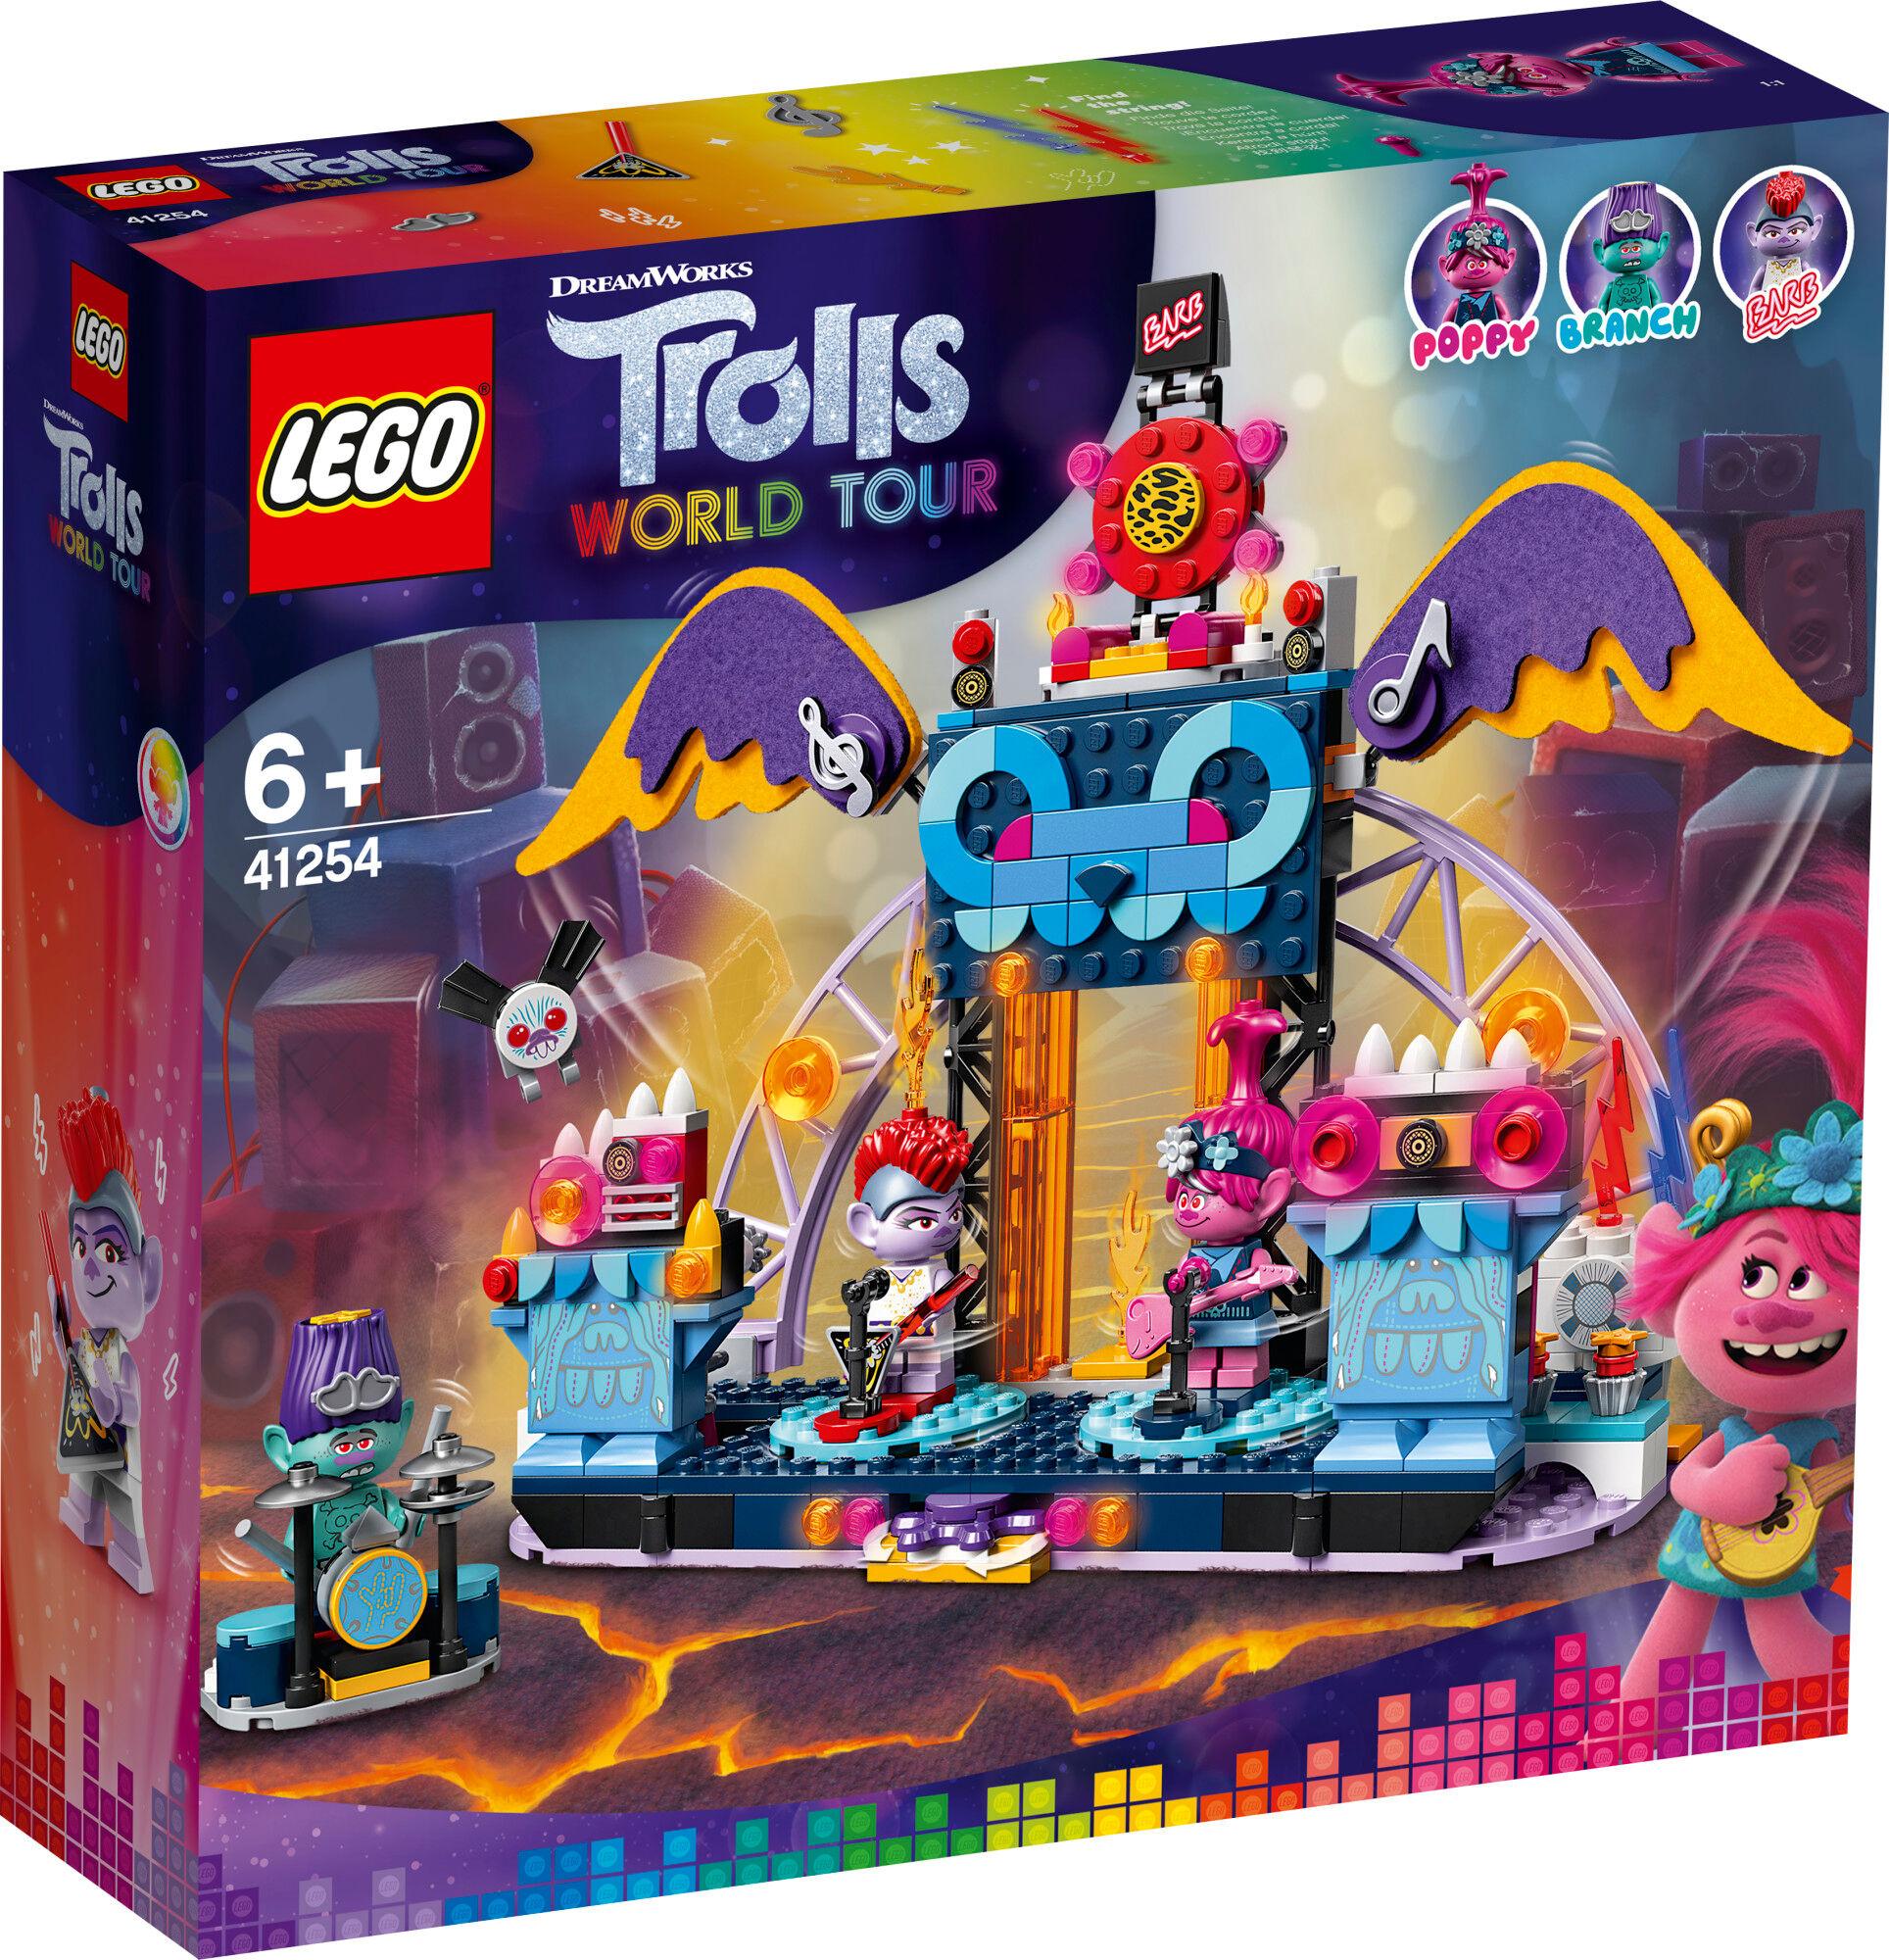 Lego 41254 Trolls Volcano Rock Cityn konsertti